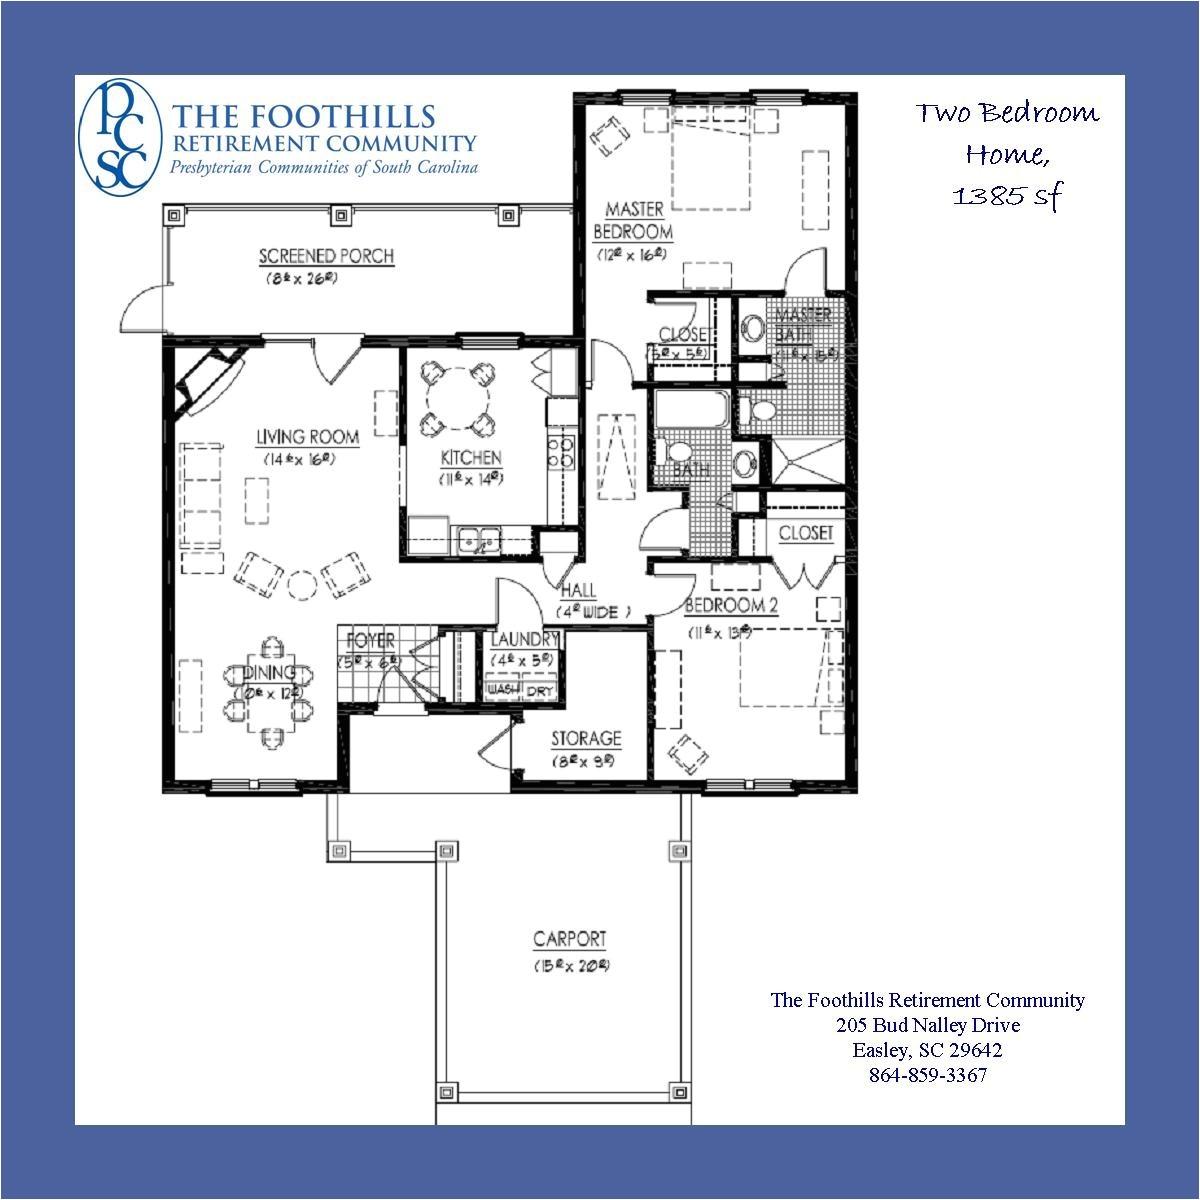 patio home floor plans free fresh patio home floor plans free